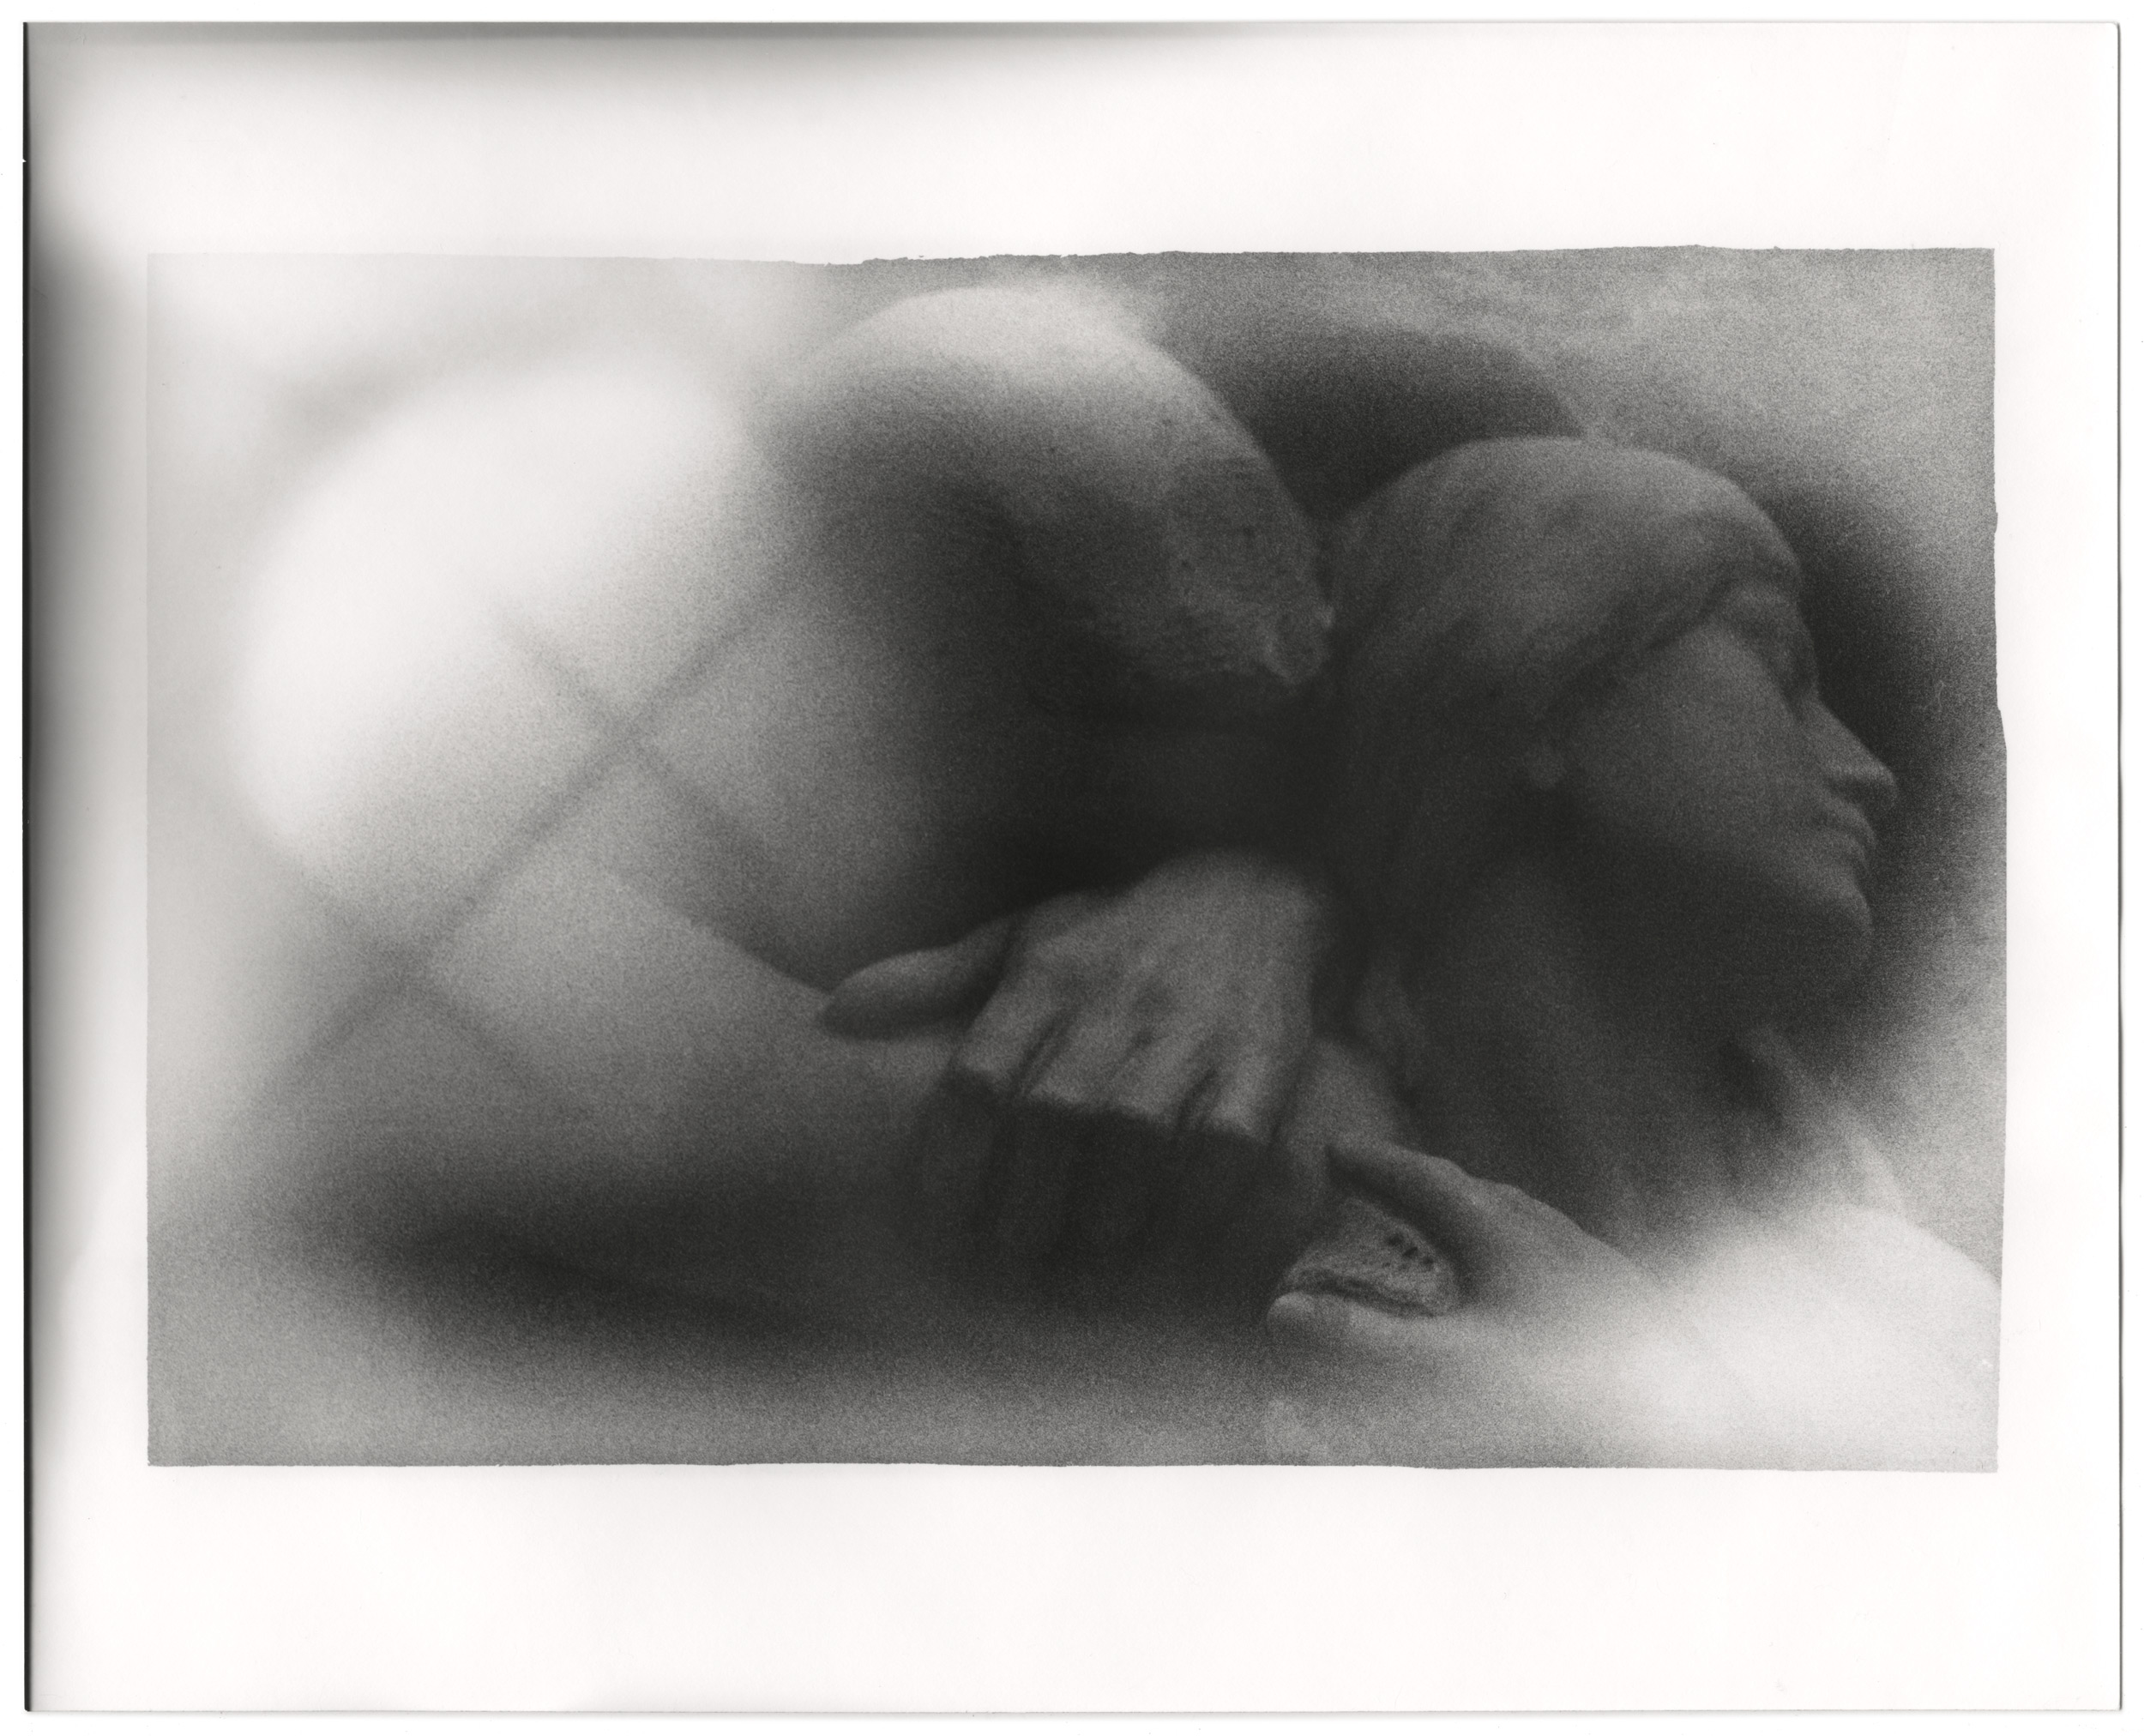 noncorpum 26, solitude of the soul